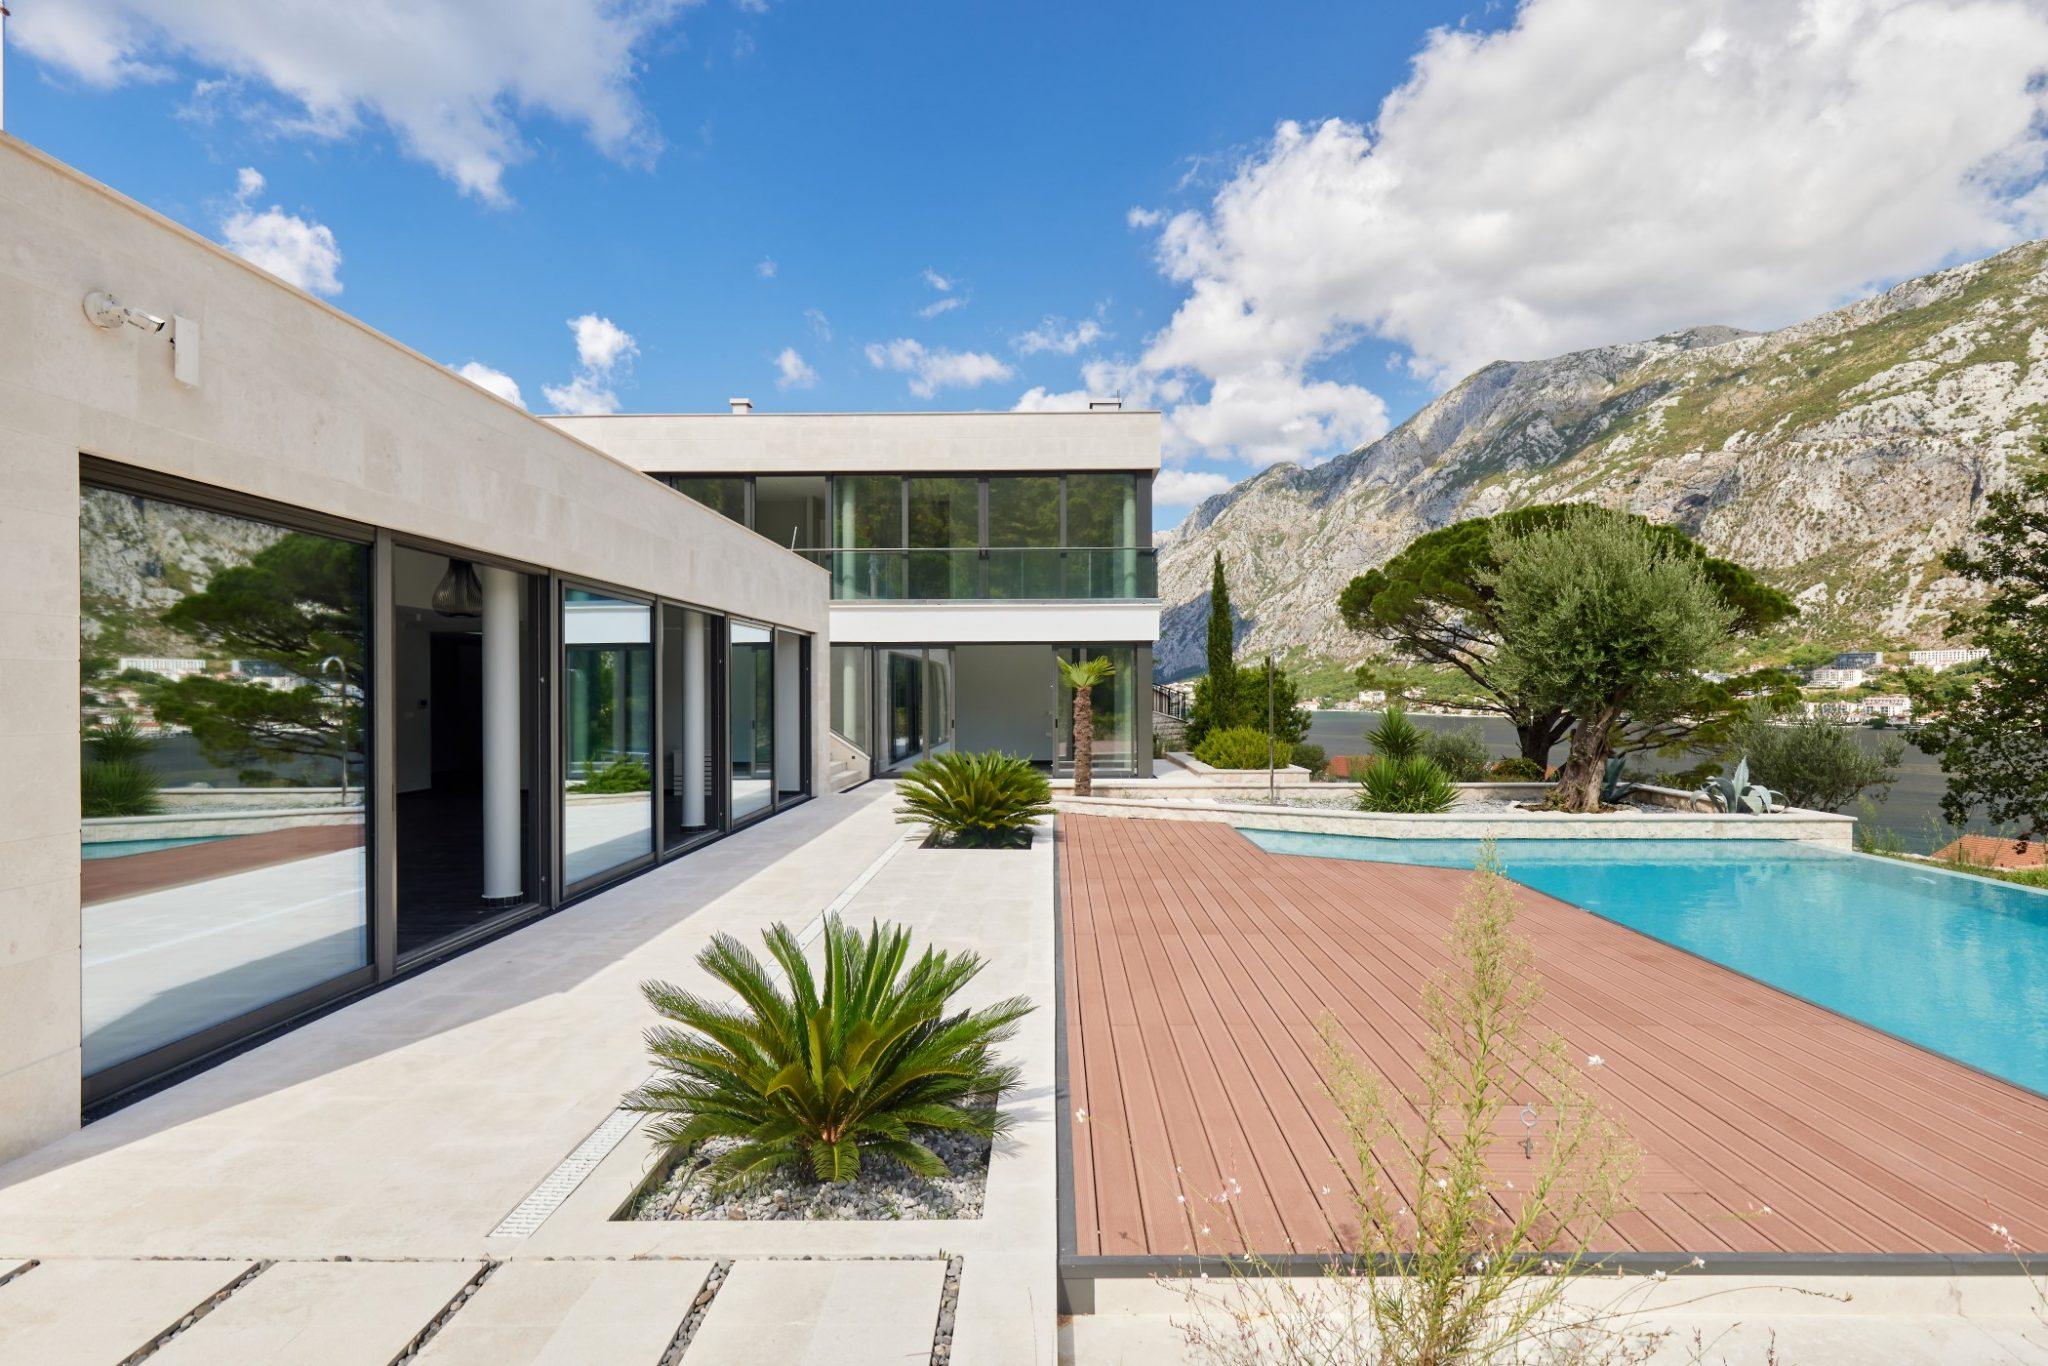 Kotor, Prčanj – luksuzna vila sa otvorenim bazenom i panoramskim pogledom na zaliv